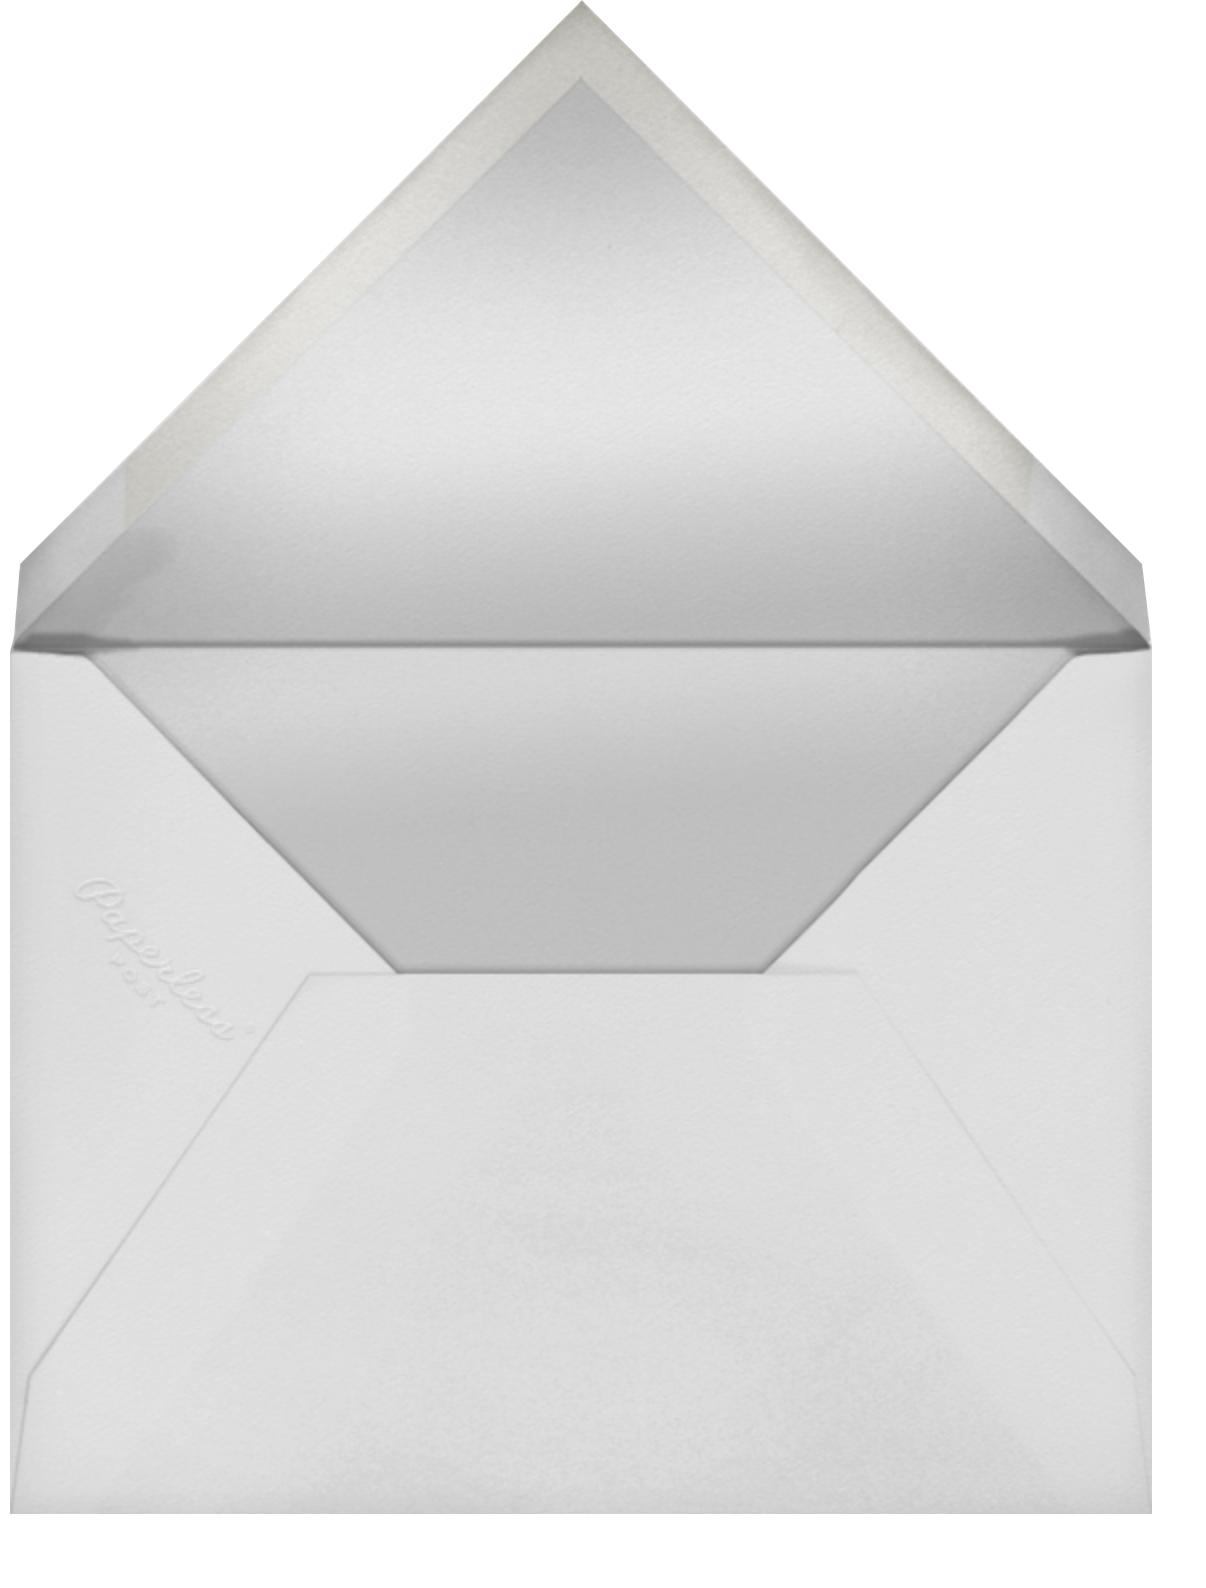 Mandarin Grove (Program) - Rifle Paper Co. - Menus and programs - envelope back